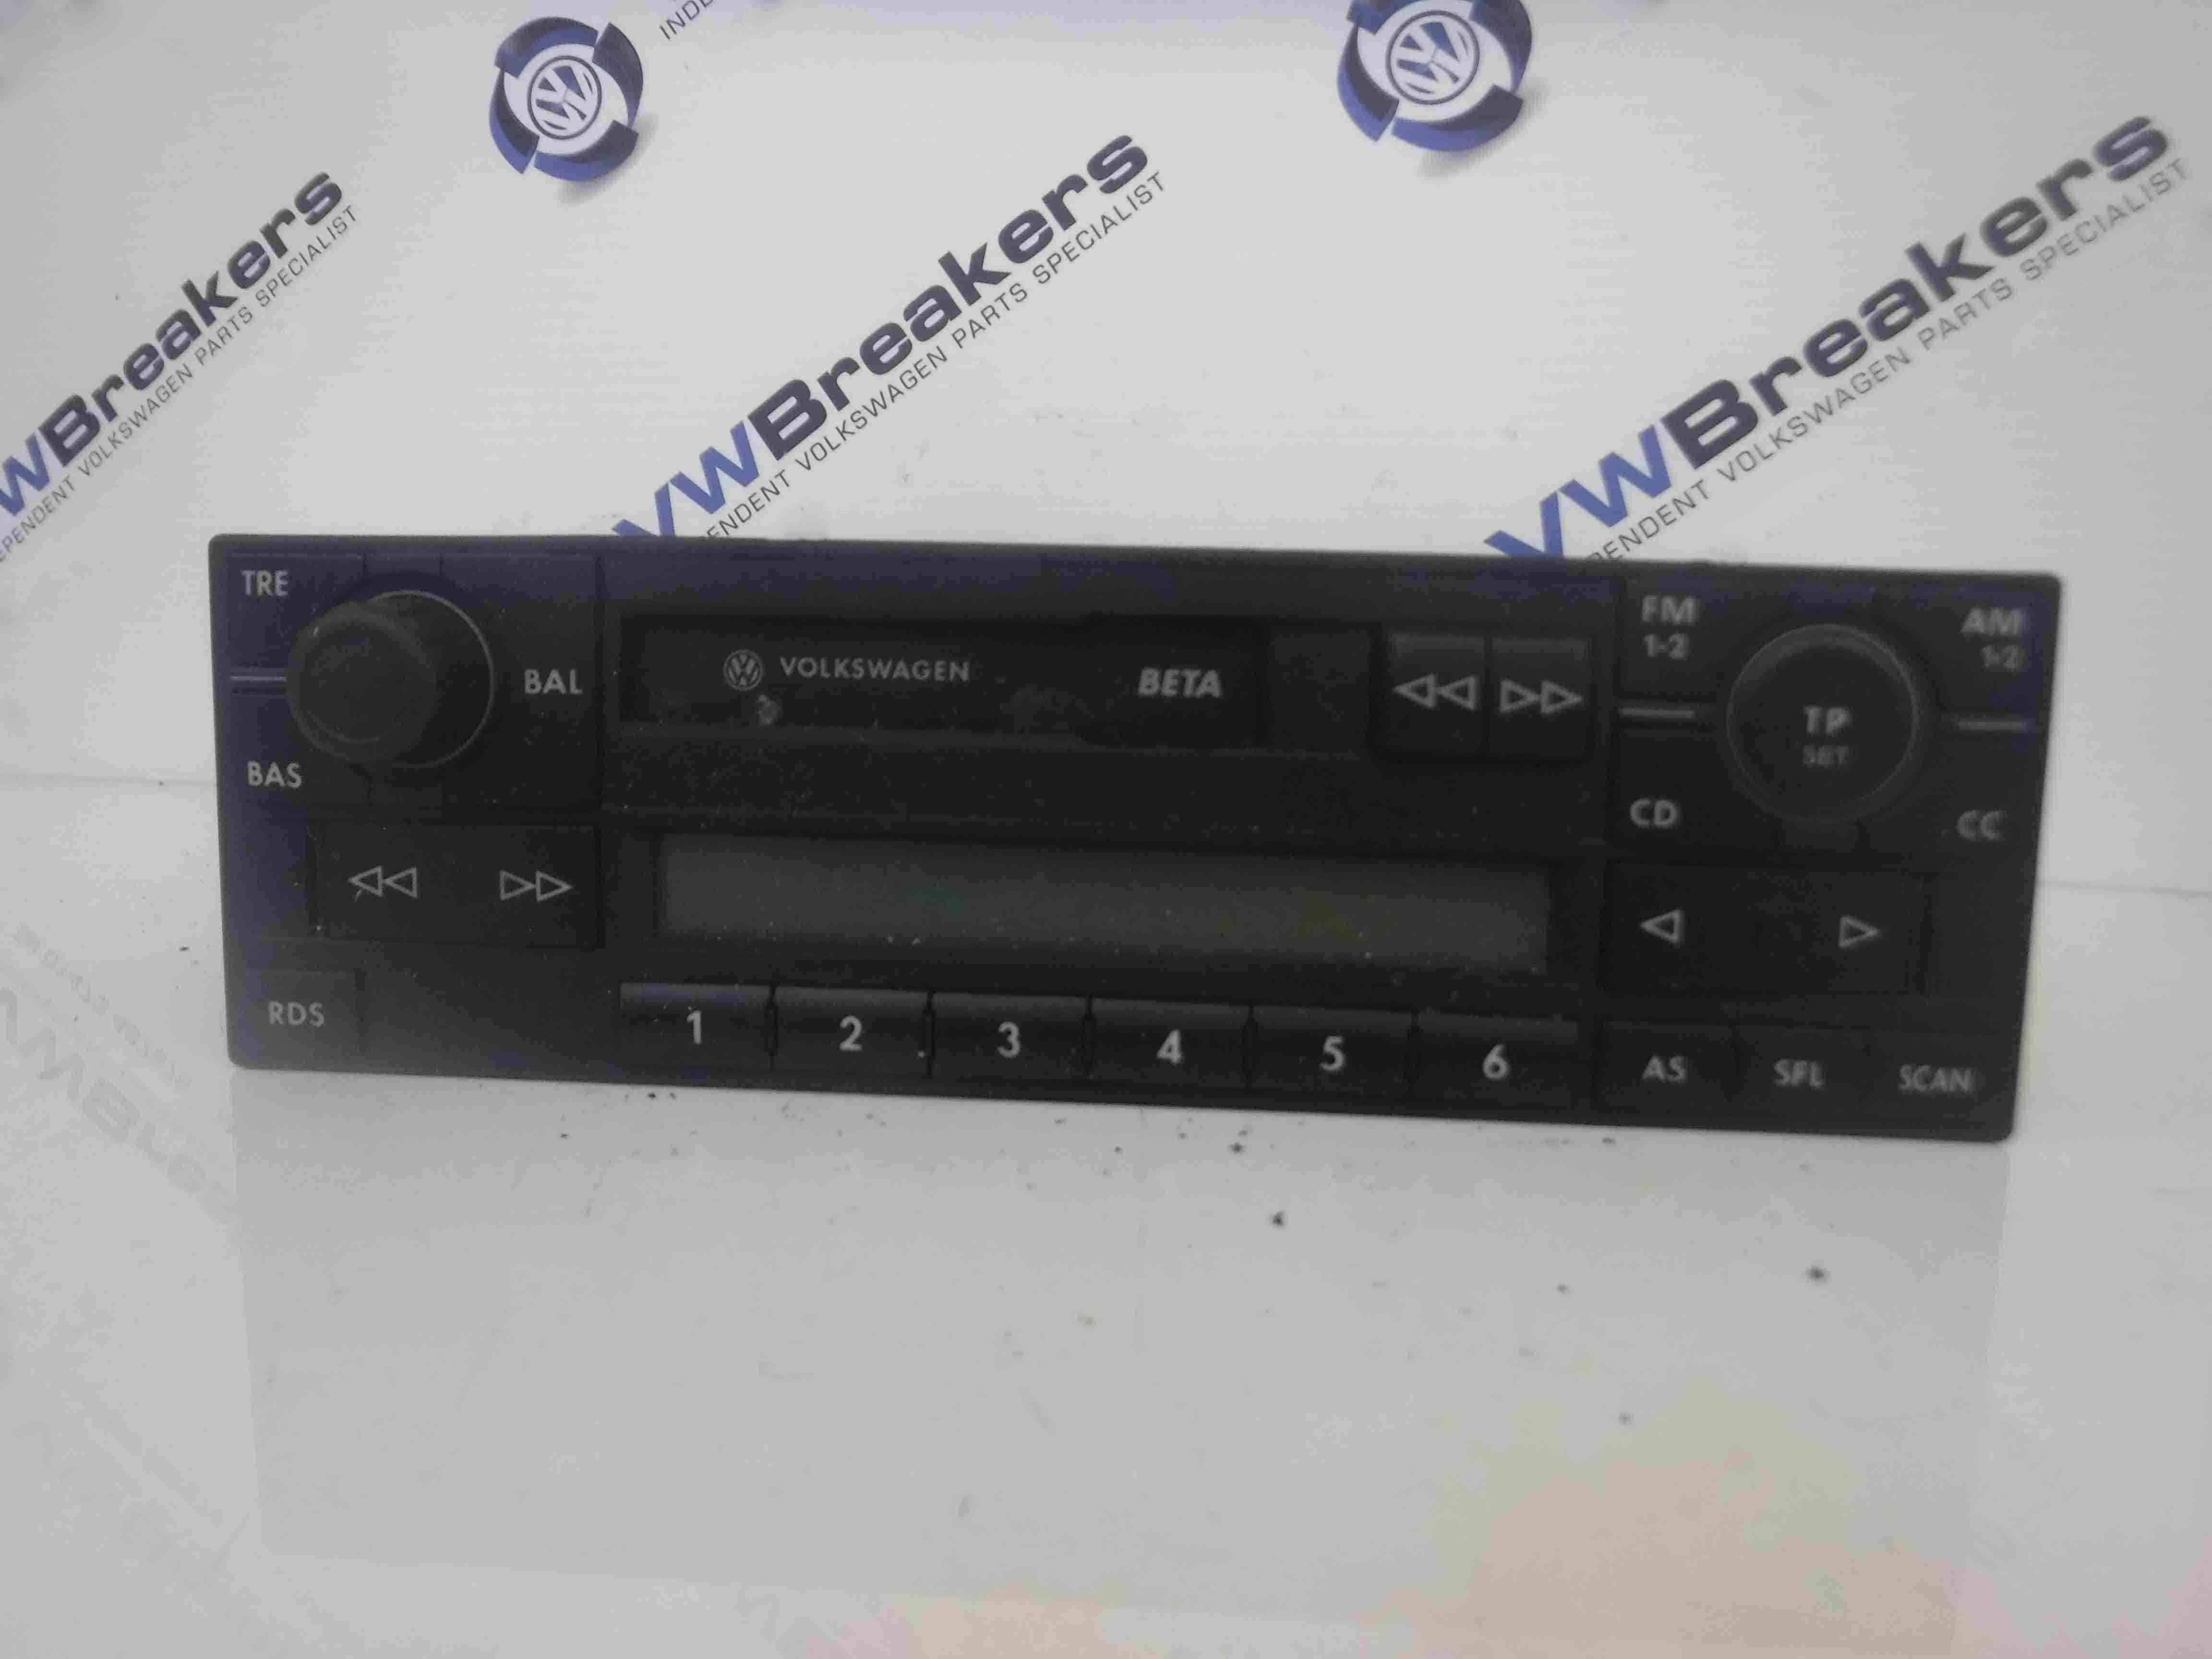 Volkswagen Polo 1999-2006 6N2 9N Radio Tape Casette Player 6X0035152B